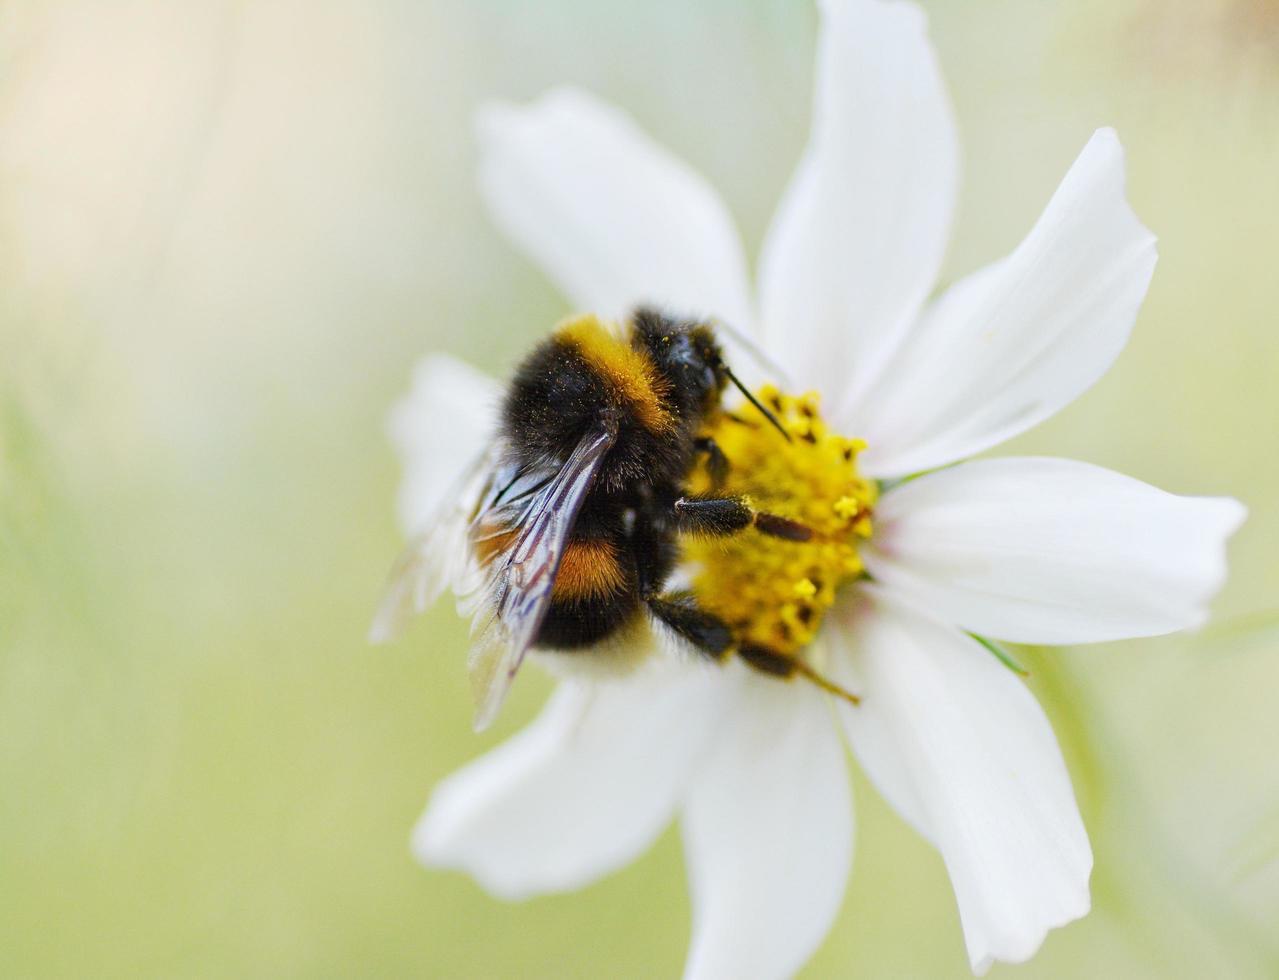 abejorro en flor de margarita foto